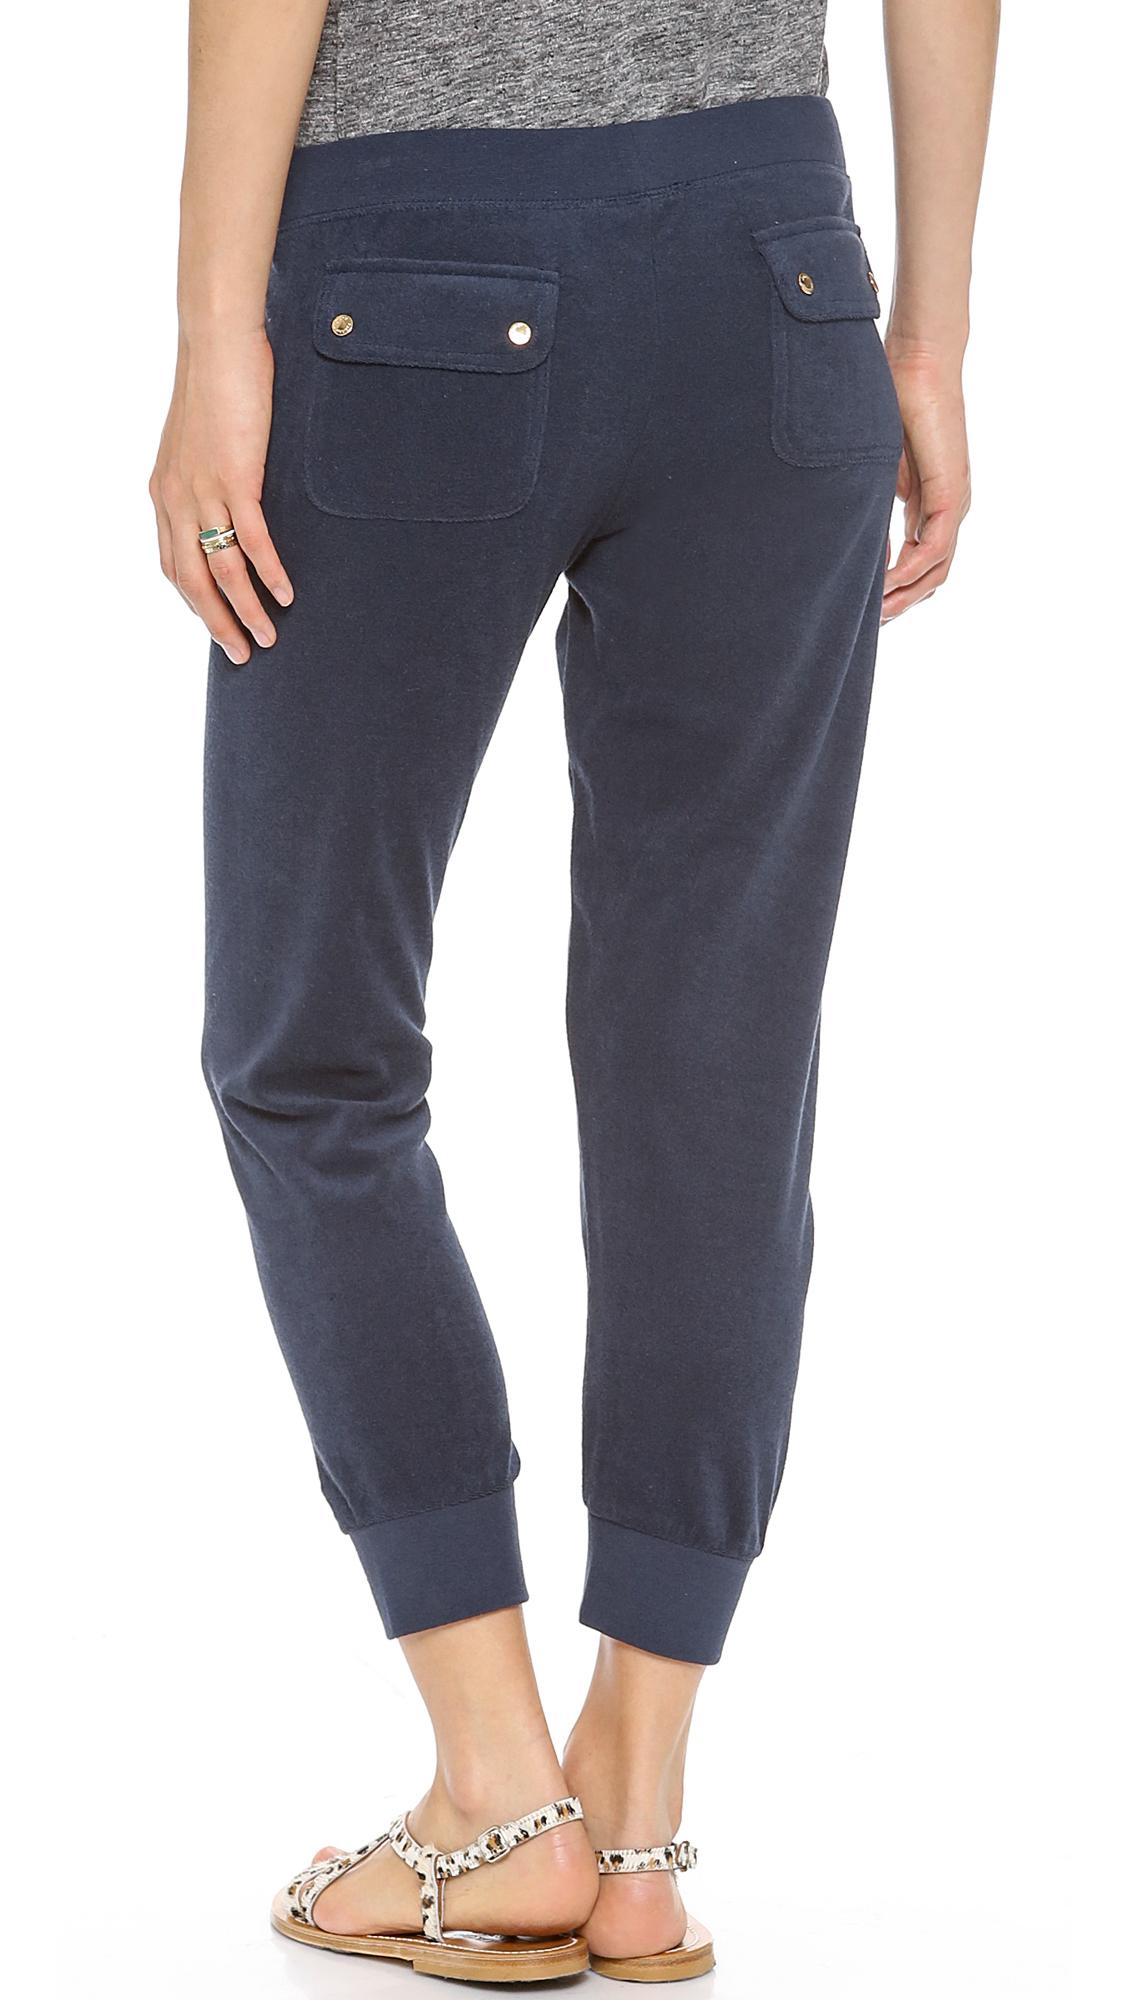 Juicy couture Terry Slim Capri Pants in Blue | Lyst